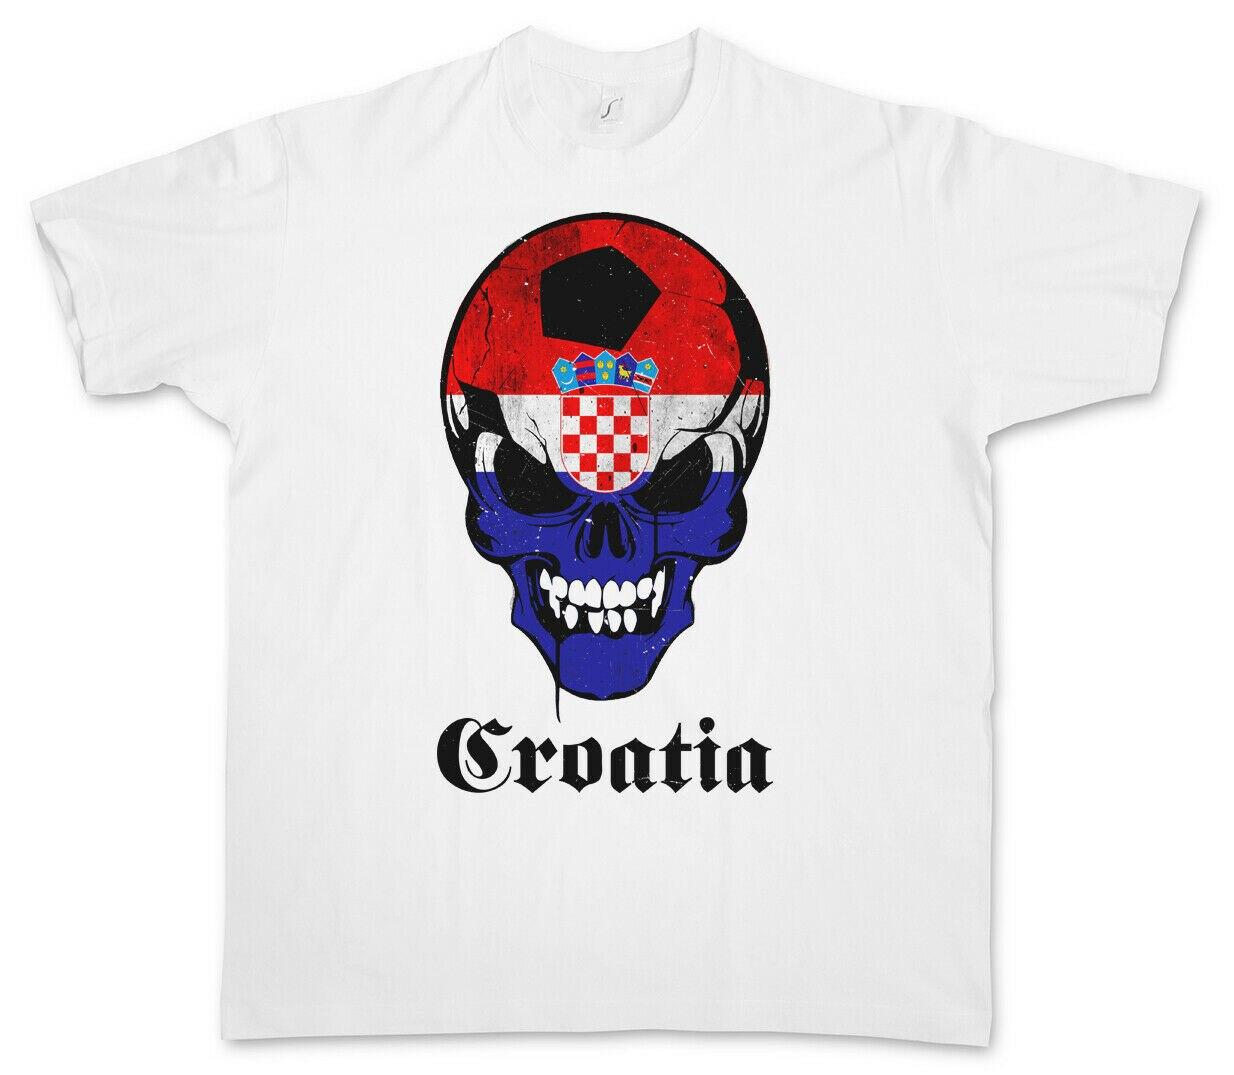 CROÁCIA FUTEBOL BANDEIRA DO CRÂNIO T-SHIRT Flagge Sch?del Fã Fu? bola Bandeira Kroatia